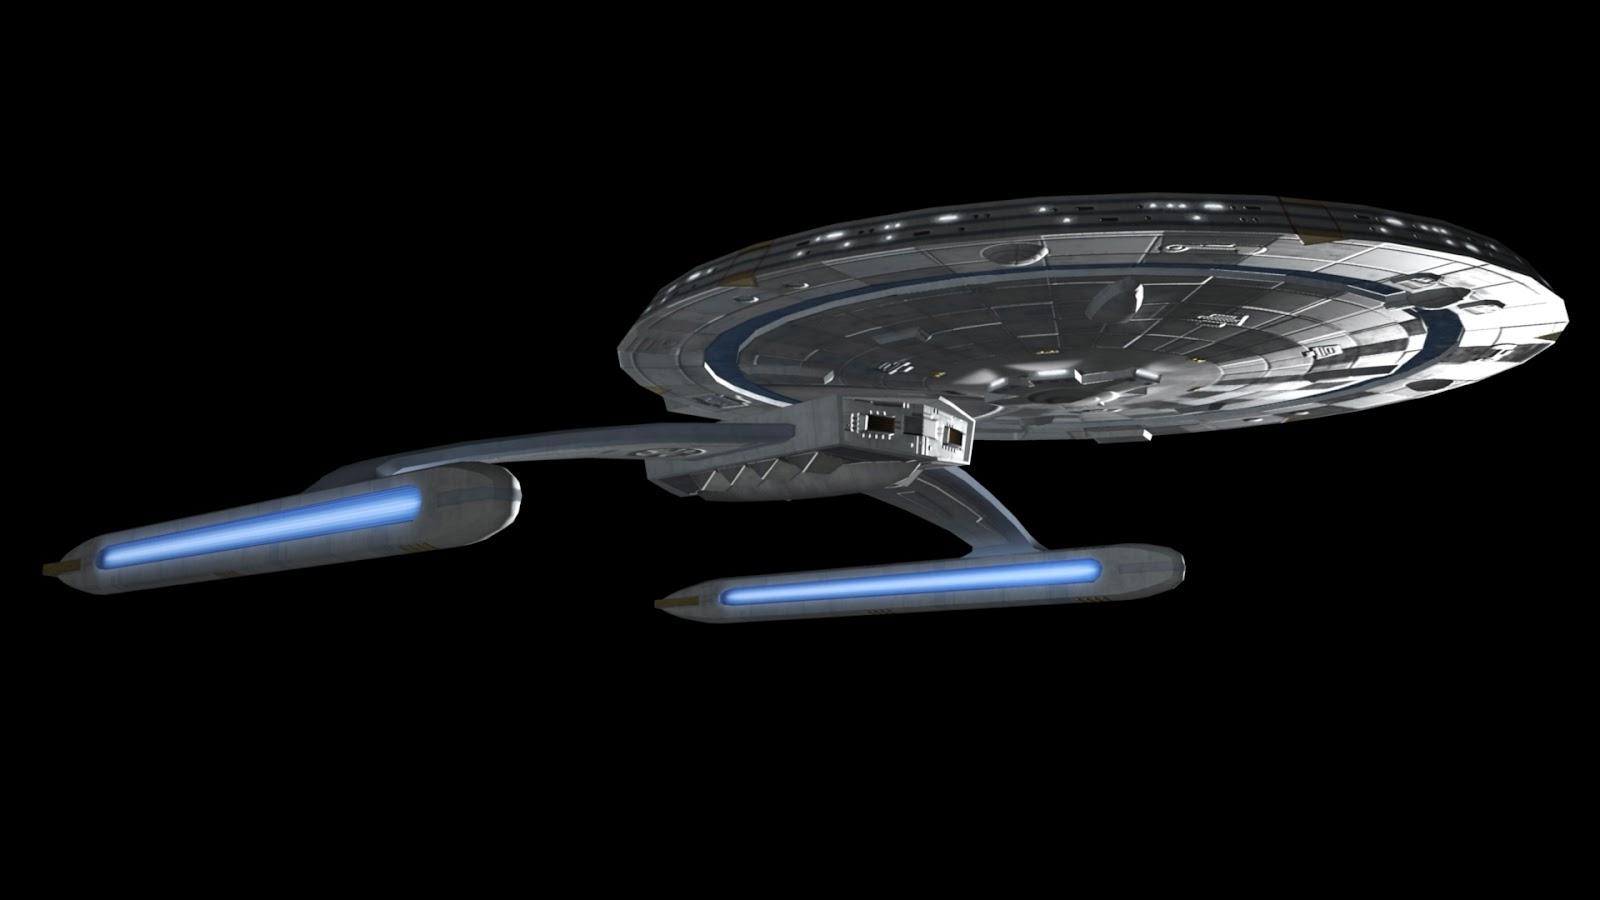 star trek future starship - photo #7